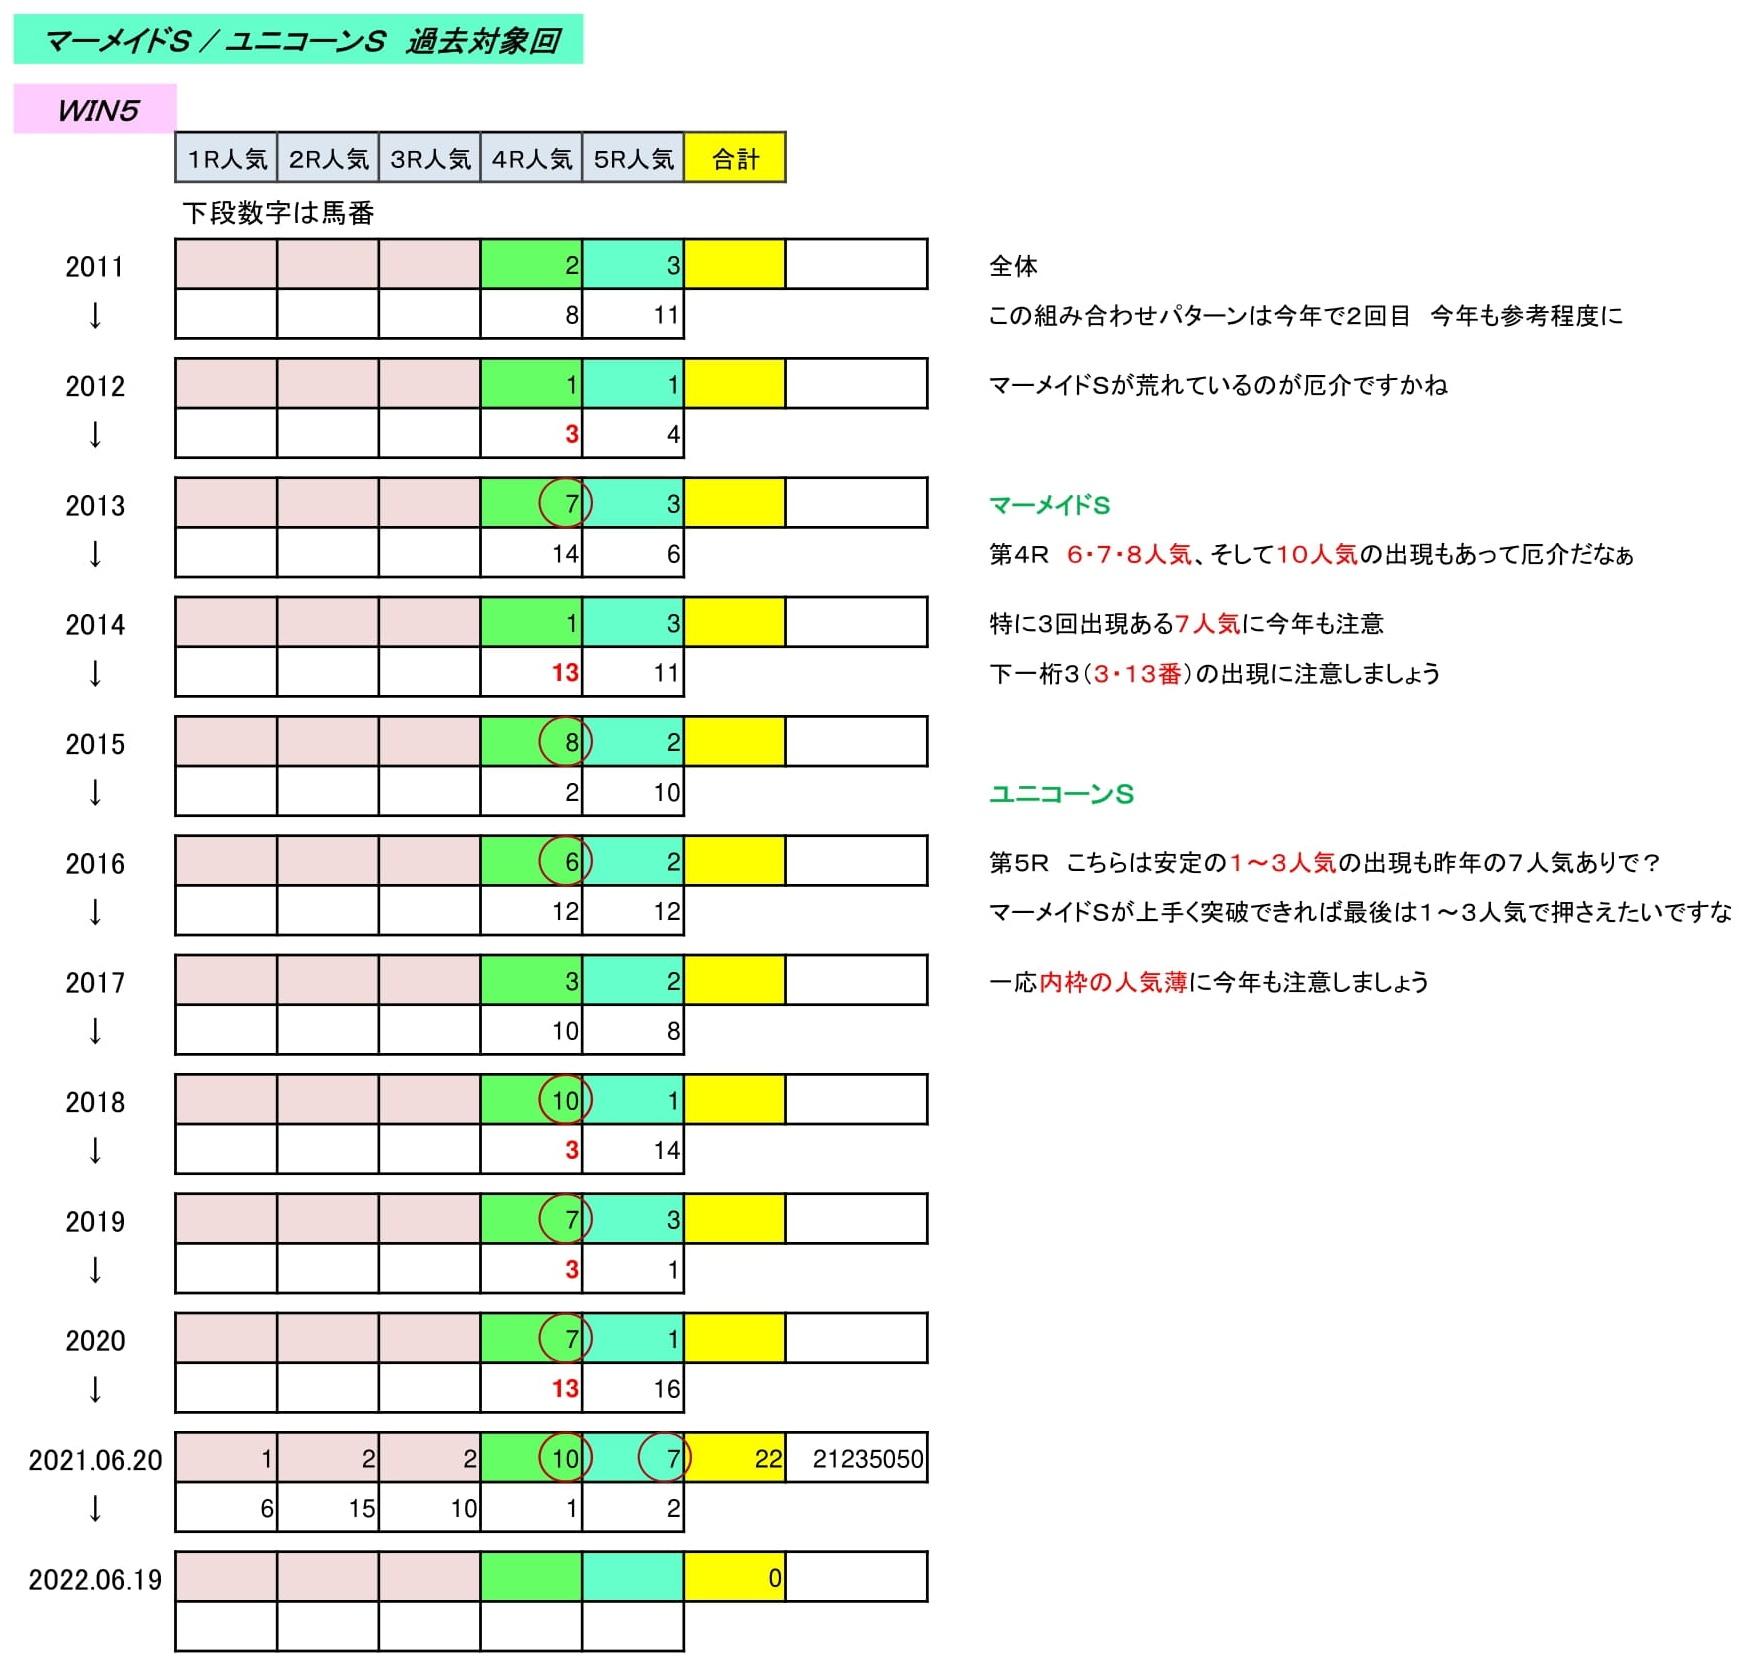 6_19_win5a.jpg